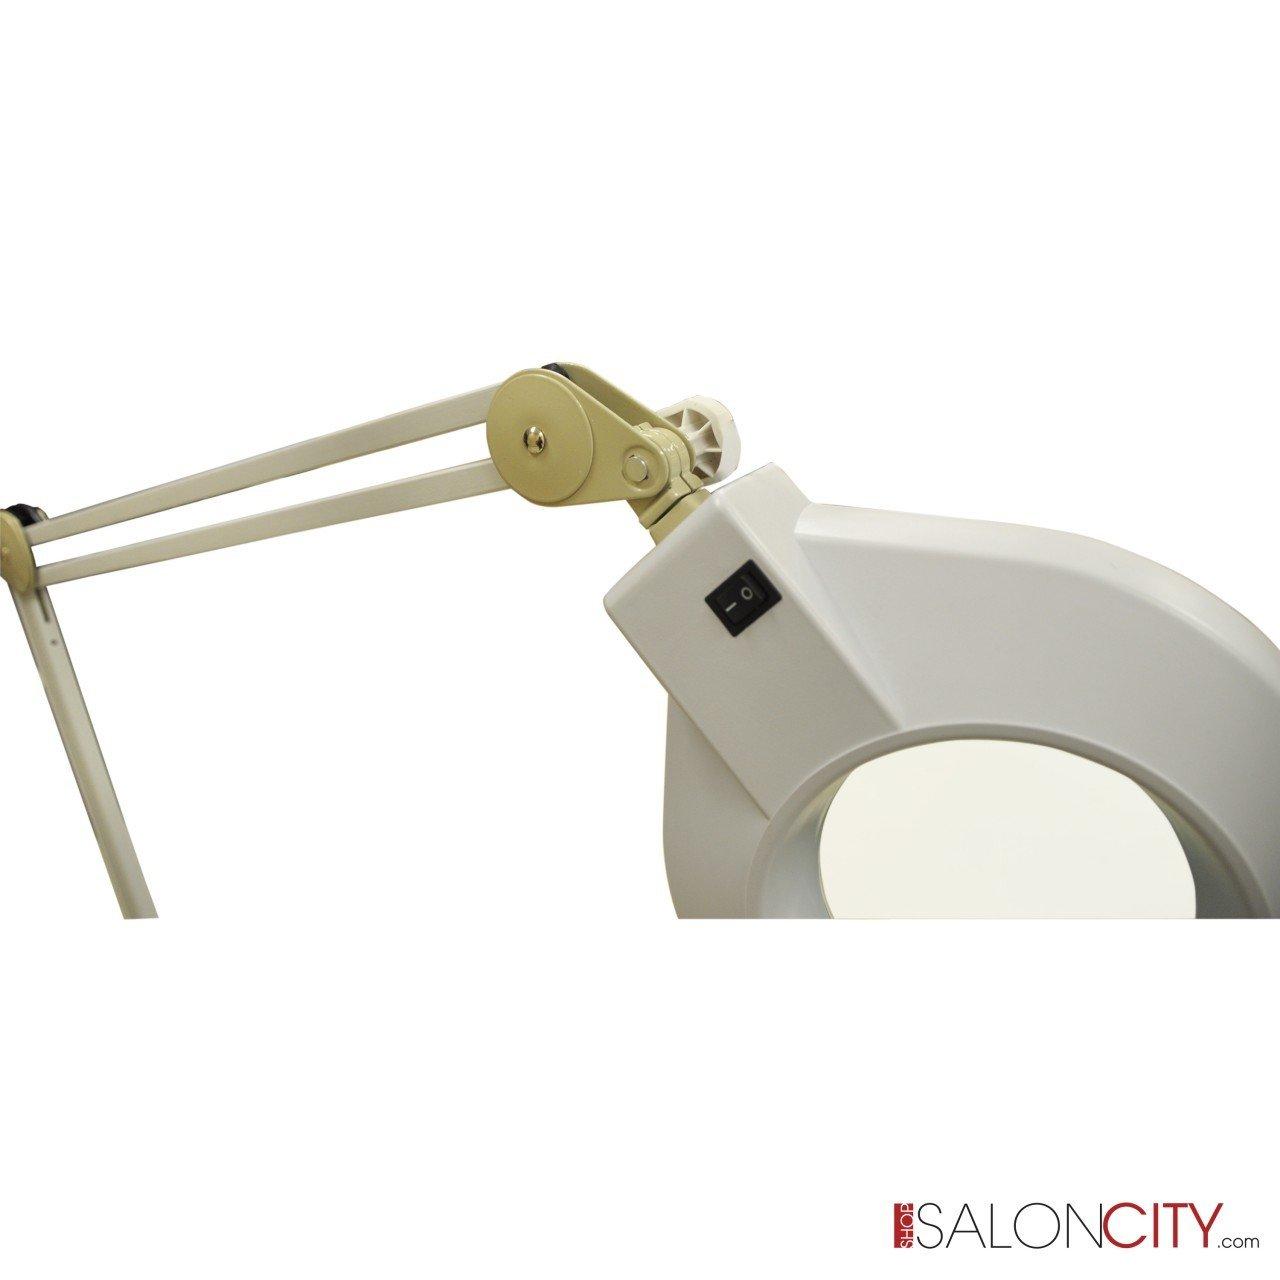 Magnifying Lamp for Salon or Spa Facial Lamp for Eyelash, Microblading, Facial Dermatologic Lamp